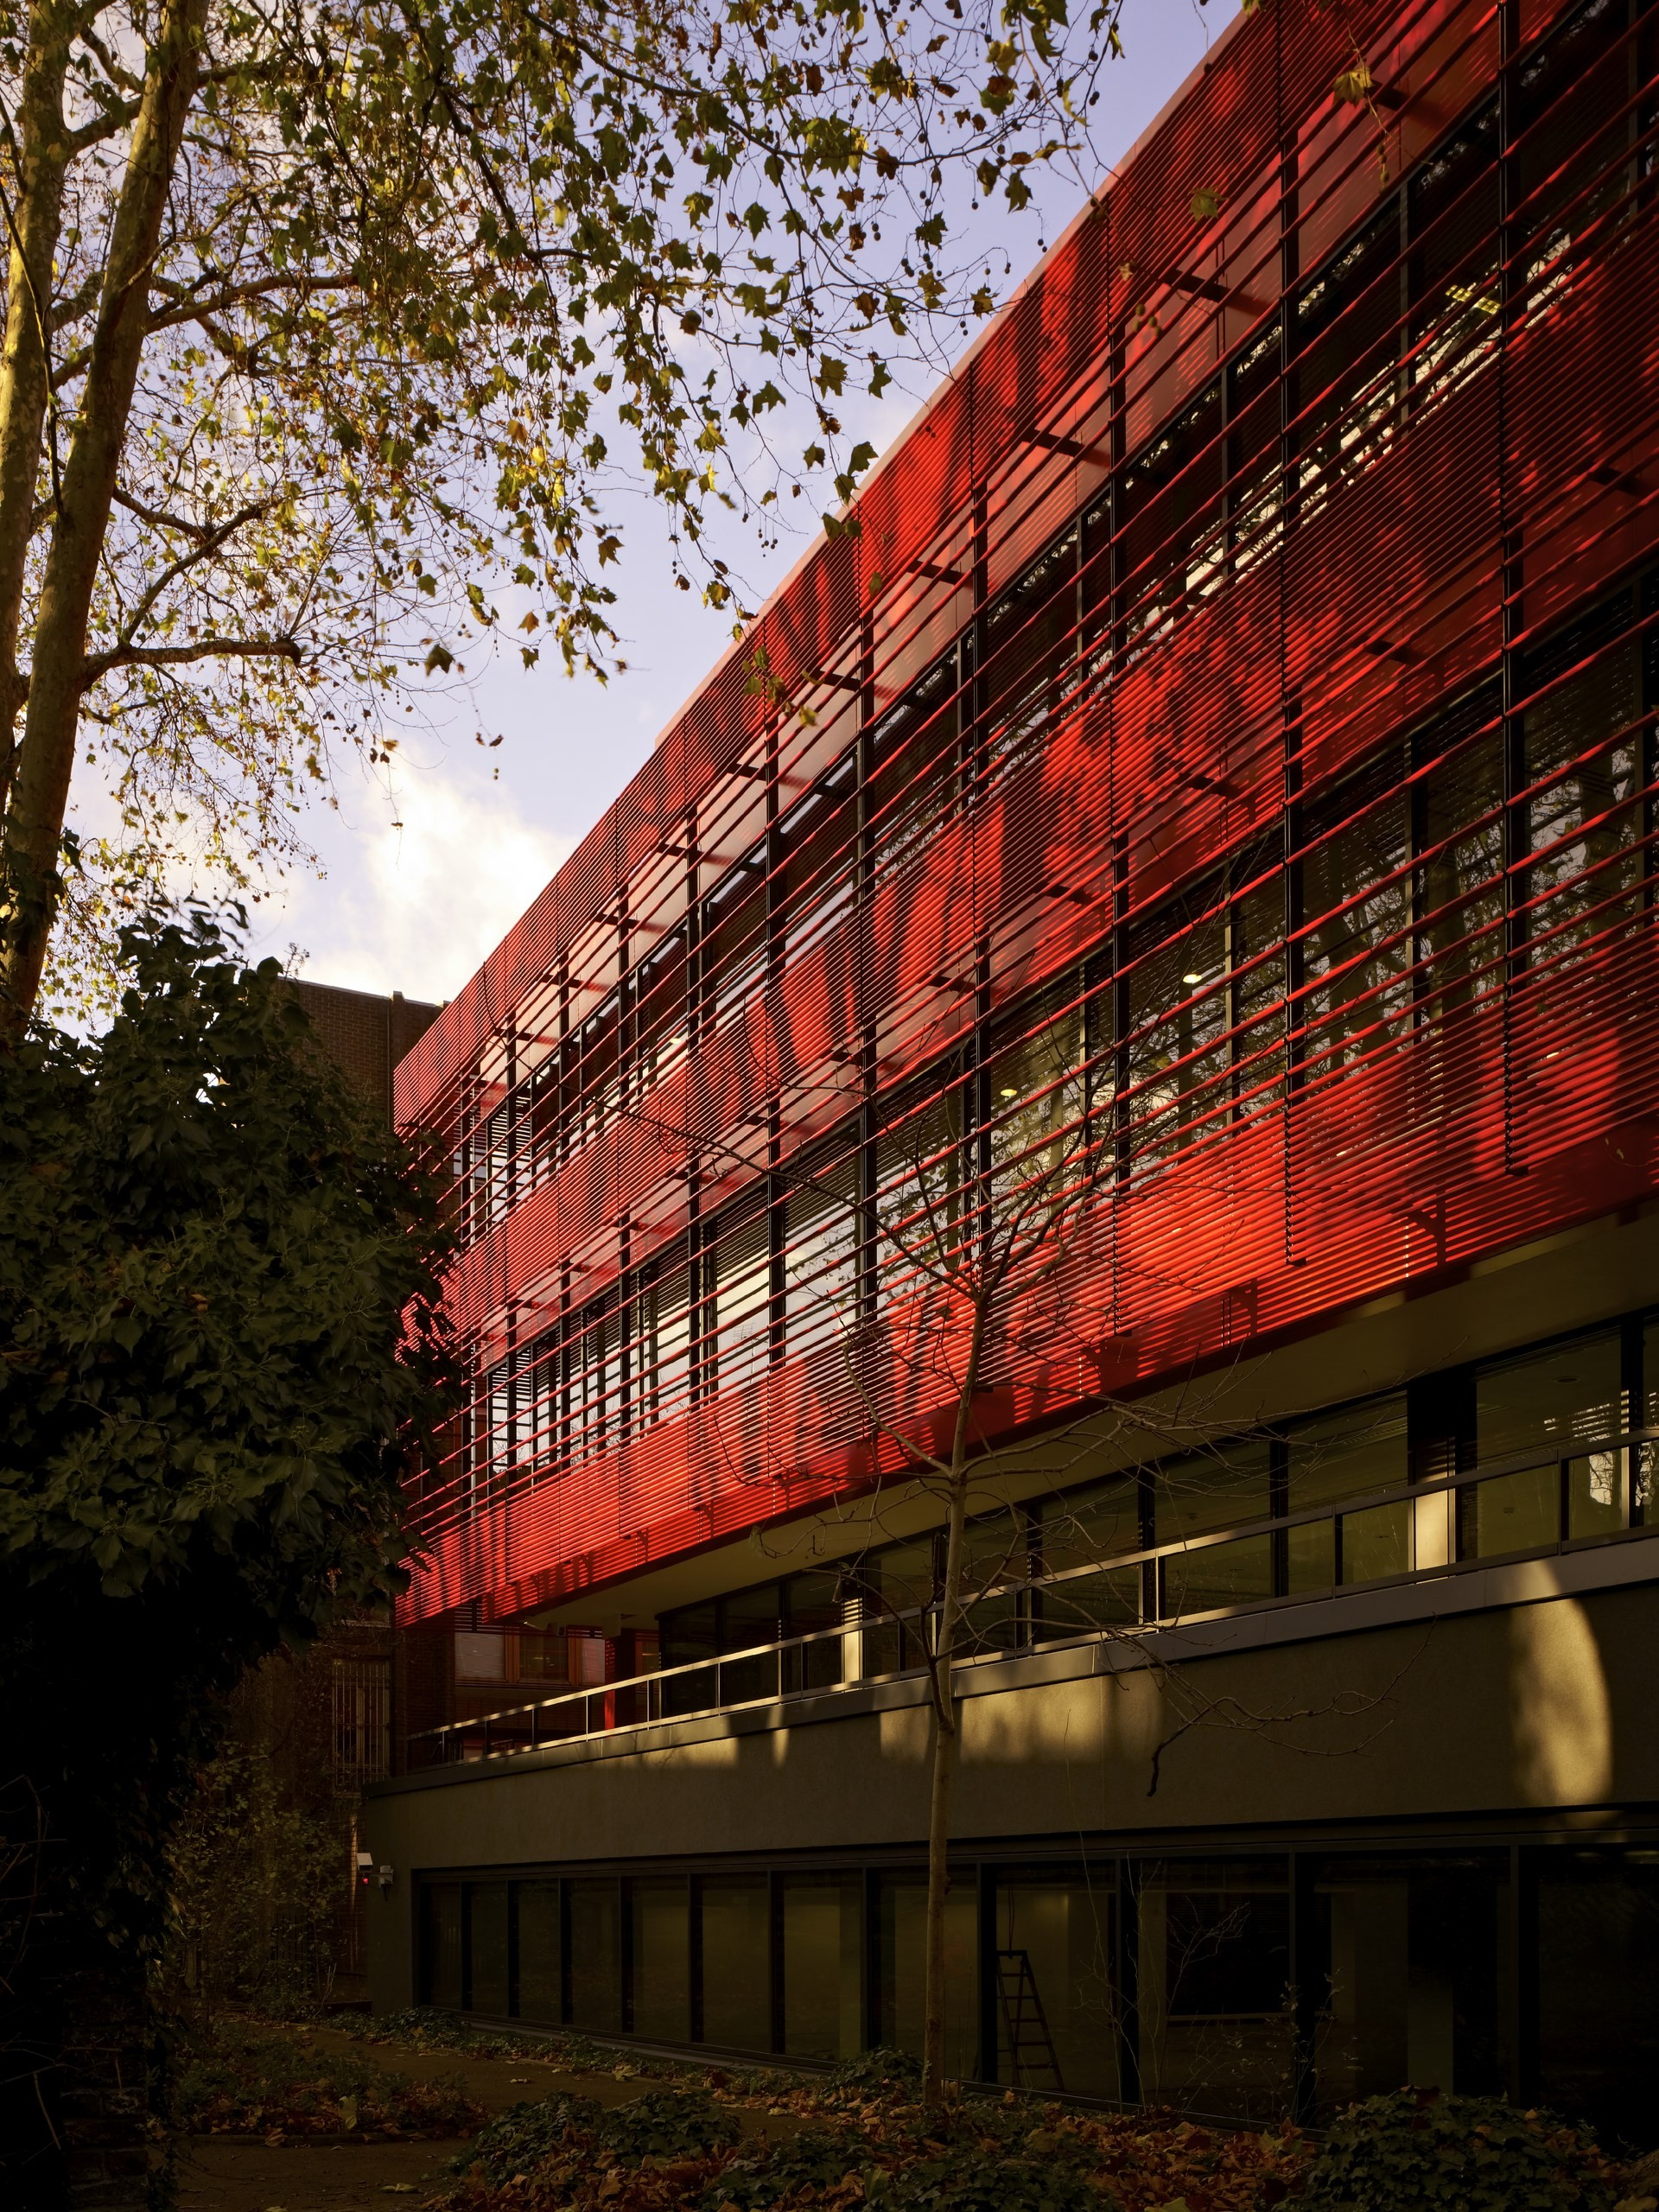 Kurt Geiger Headquarters Building / Archer Architects, © Tim Soar